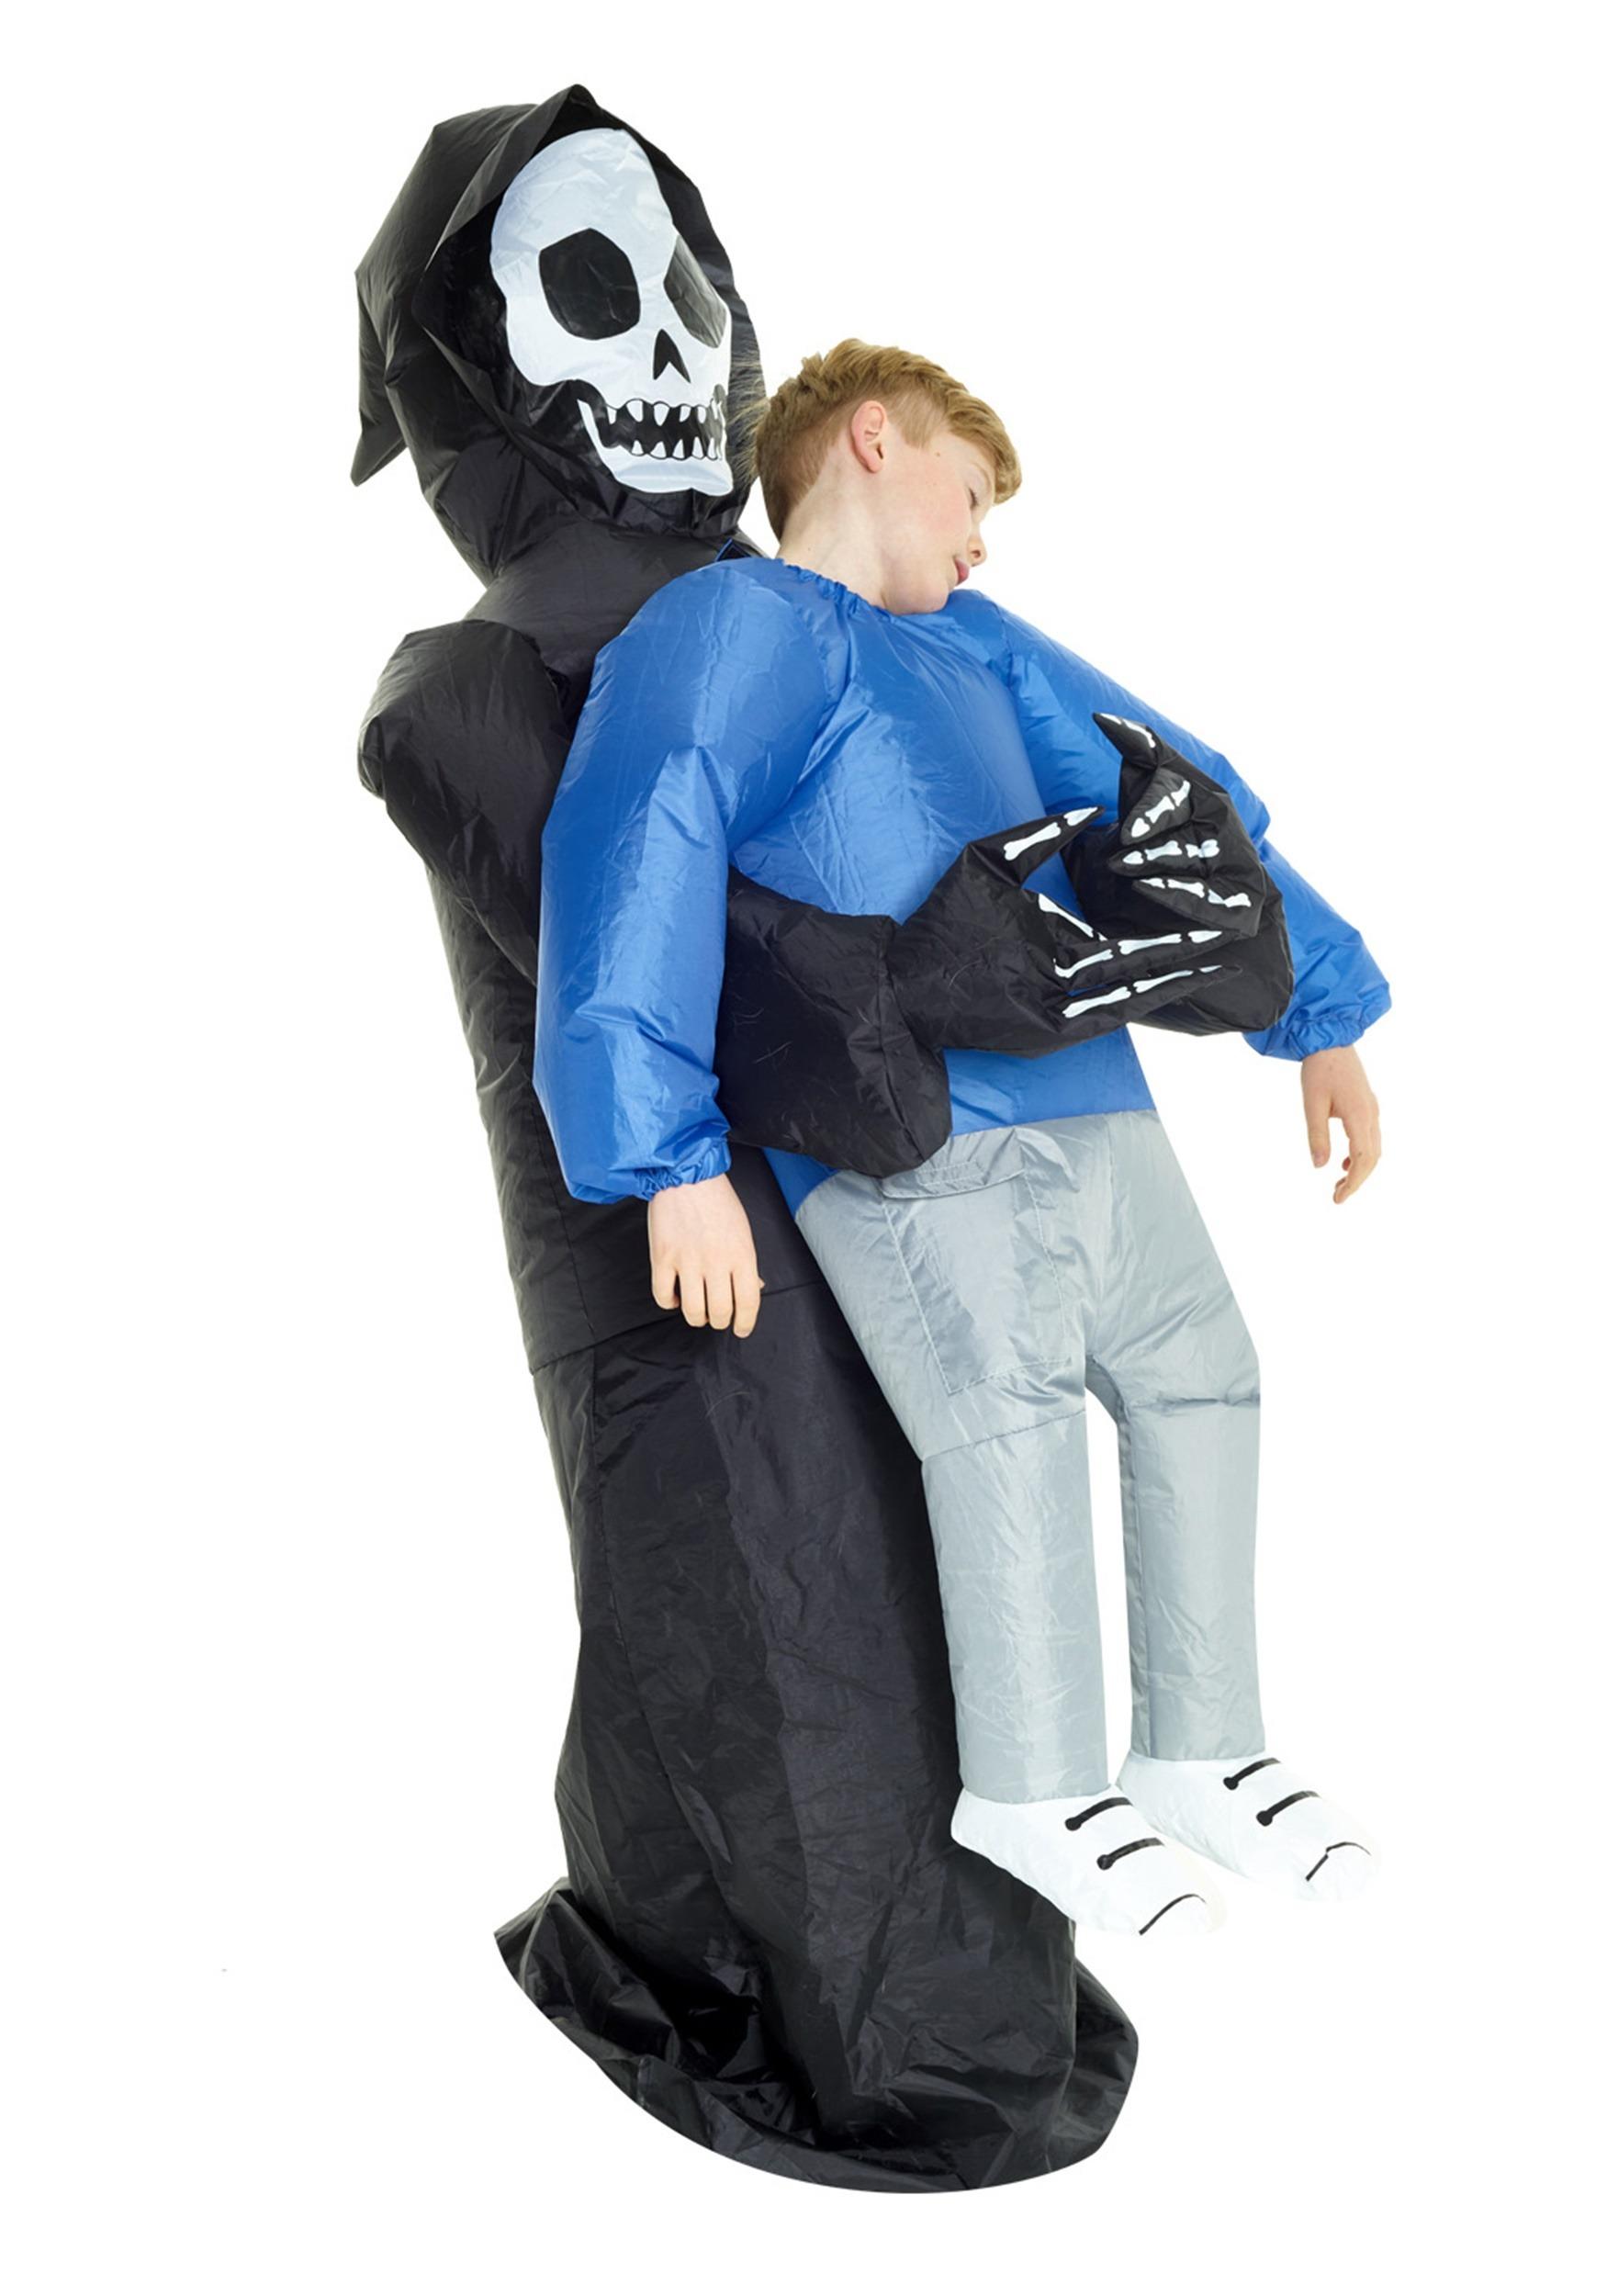 Kids lift me up Gonflable GRIM REAPER Costume Halloween Robe Fantaisie Garçons Piggy